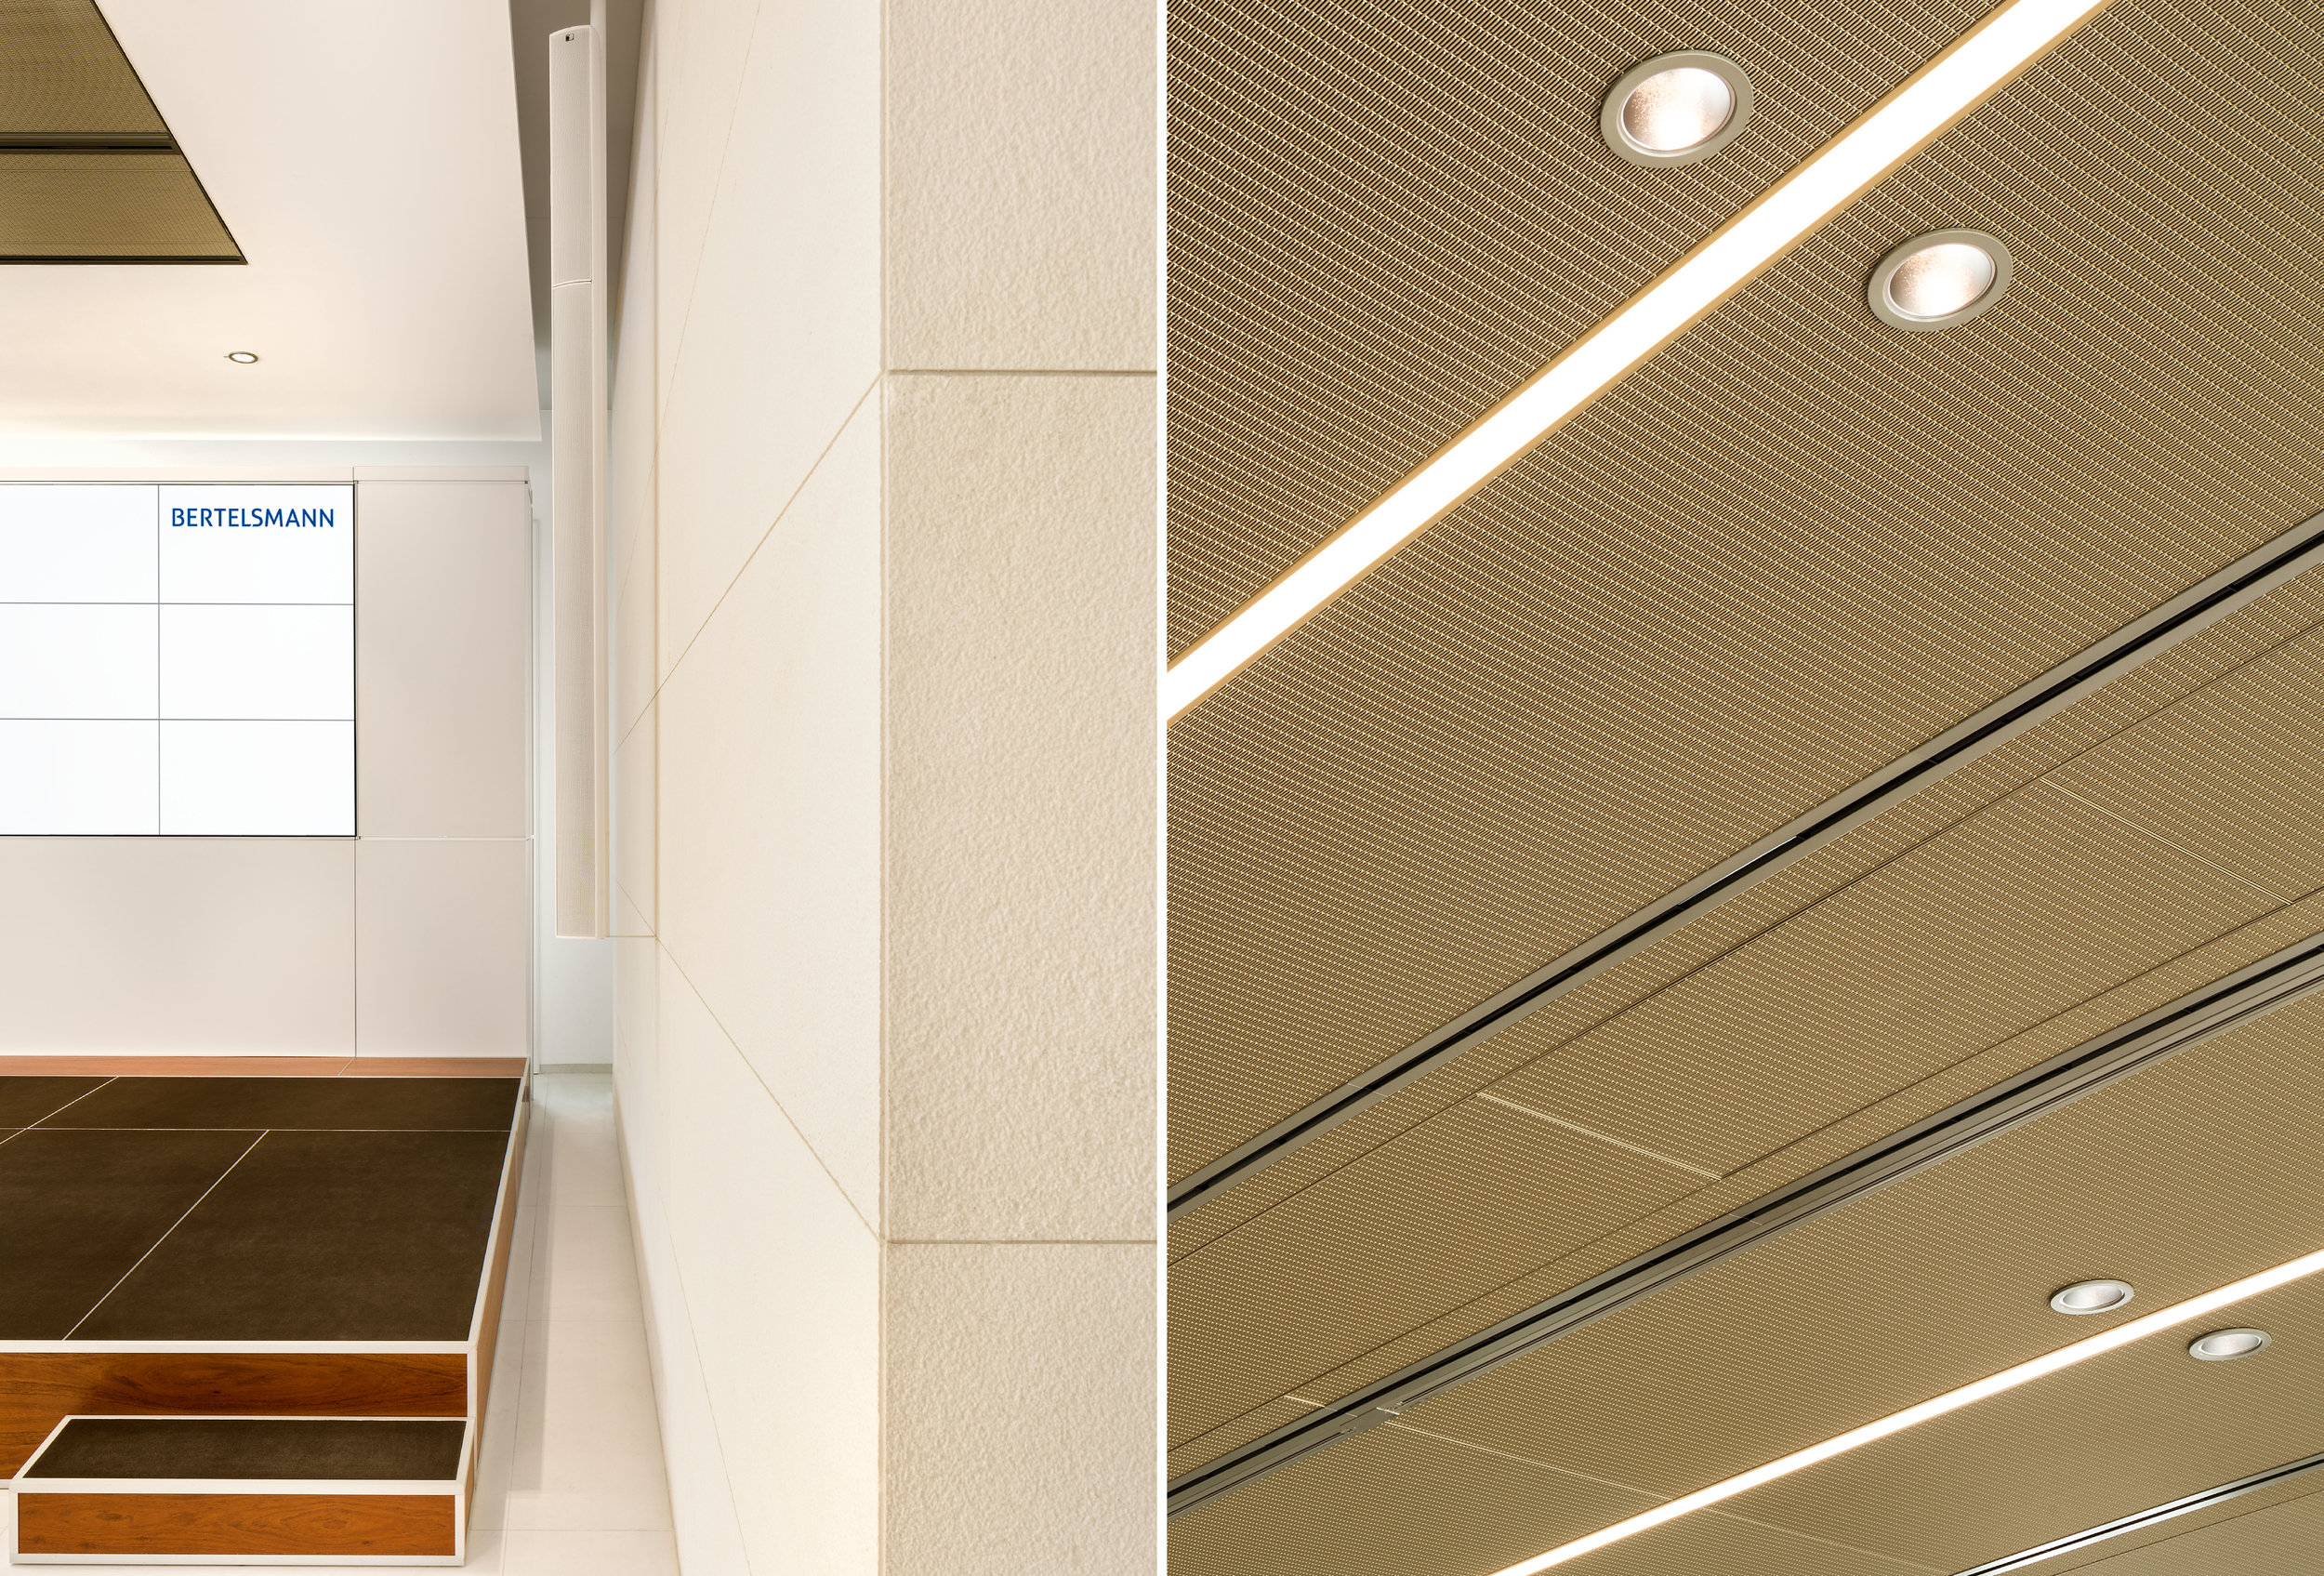 bertelsmann-berlin_coorporate-interior-design_coordination-berlin_06.jpg